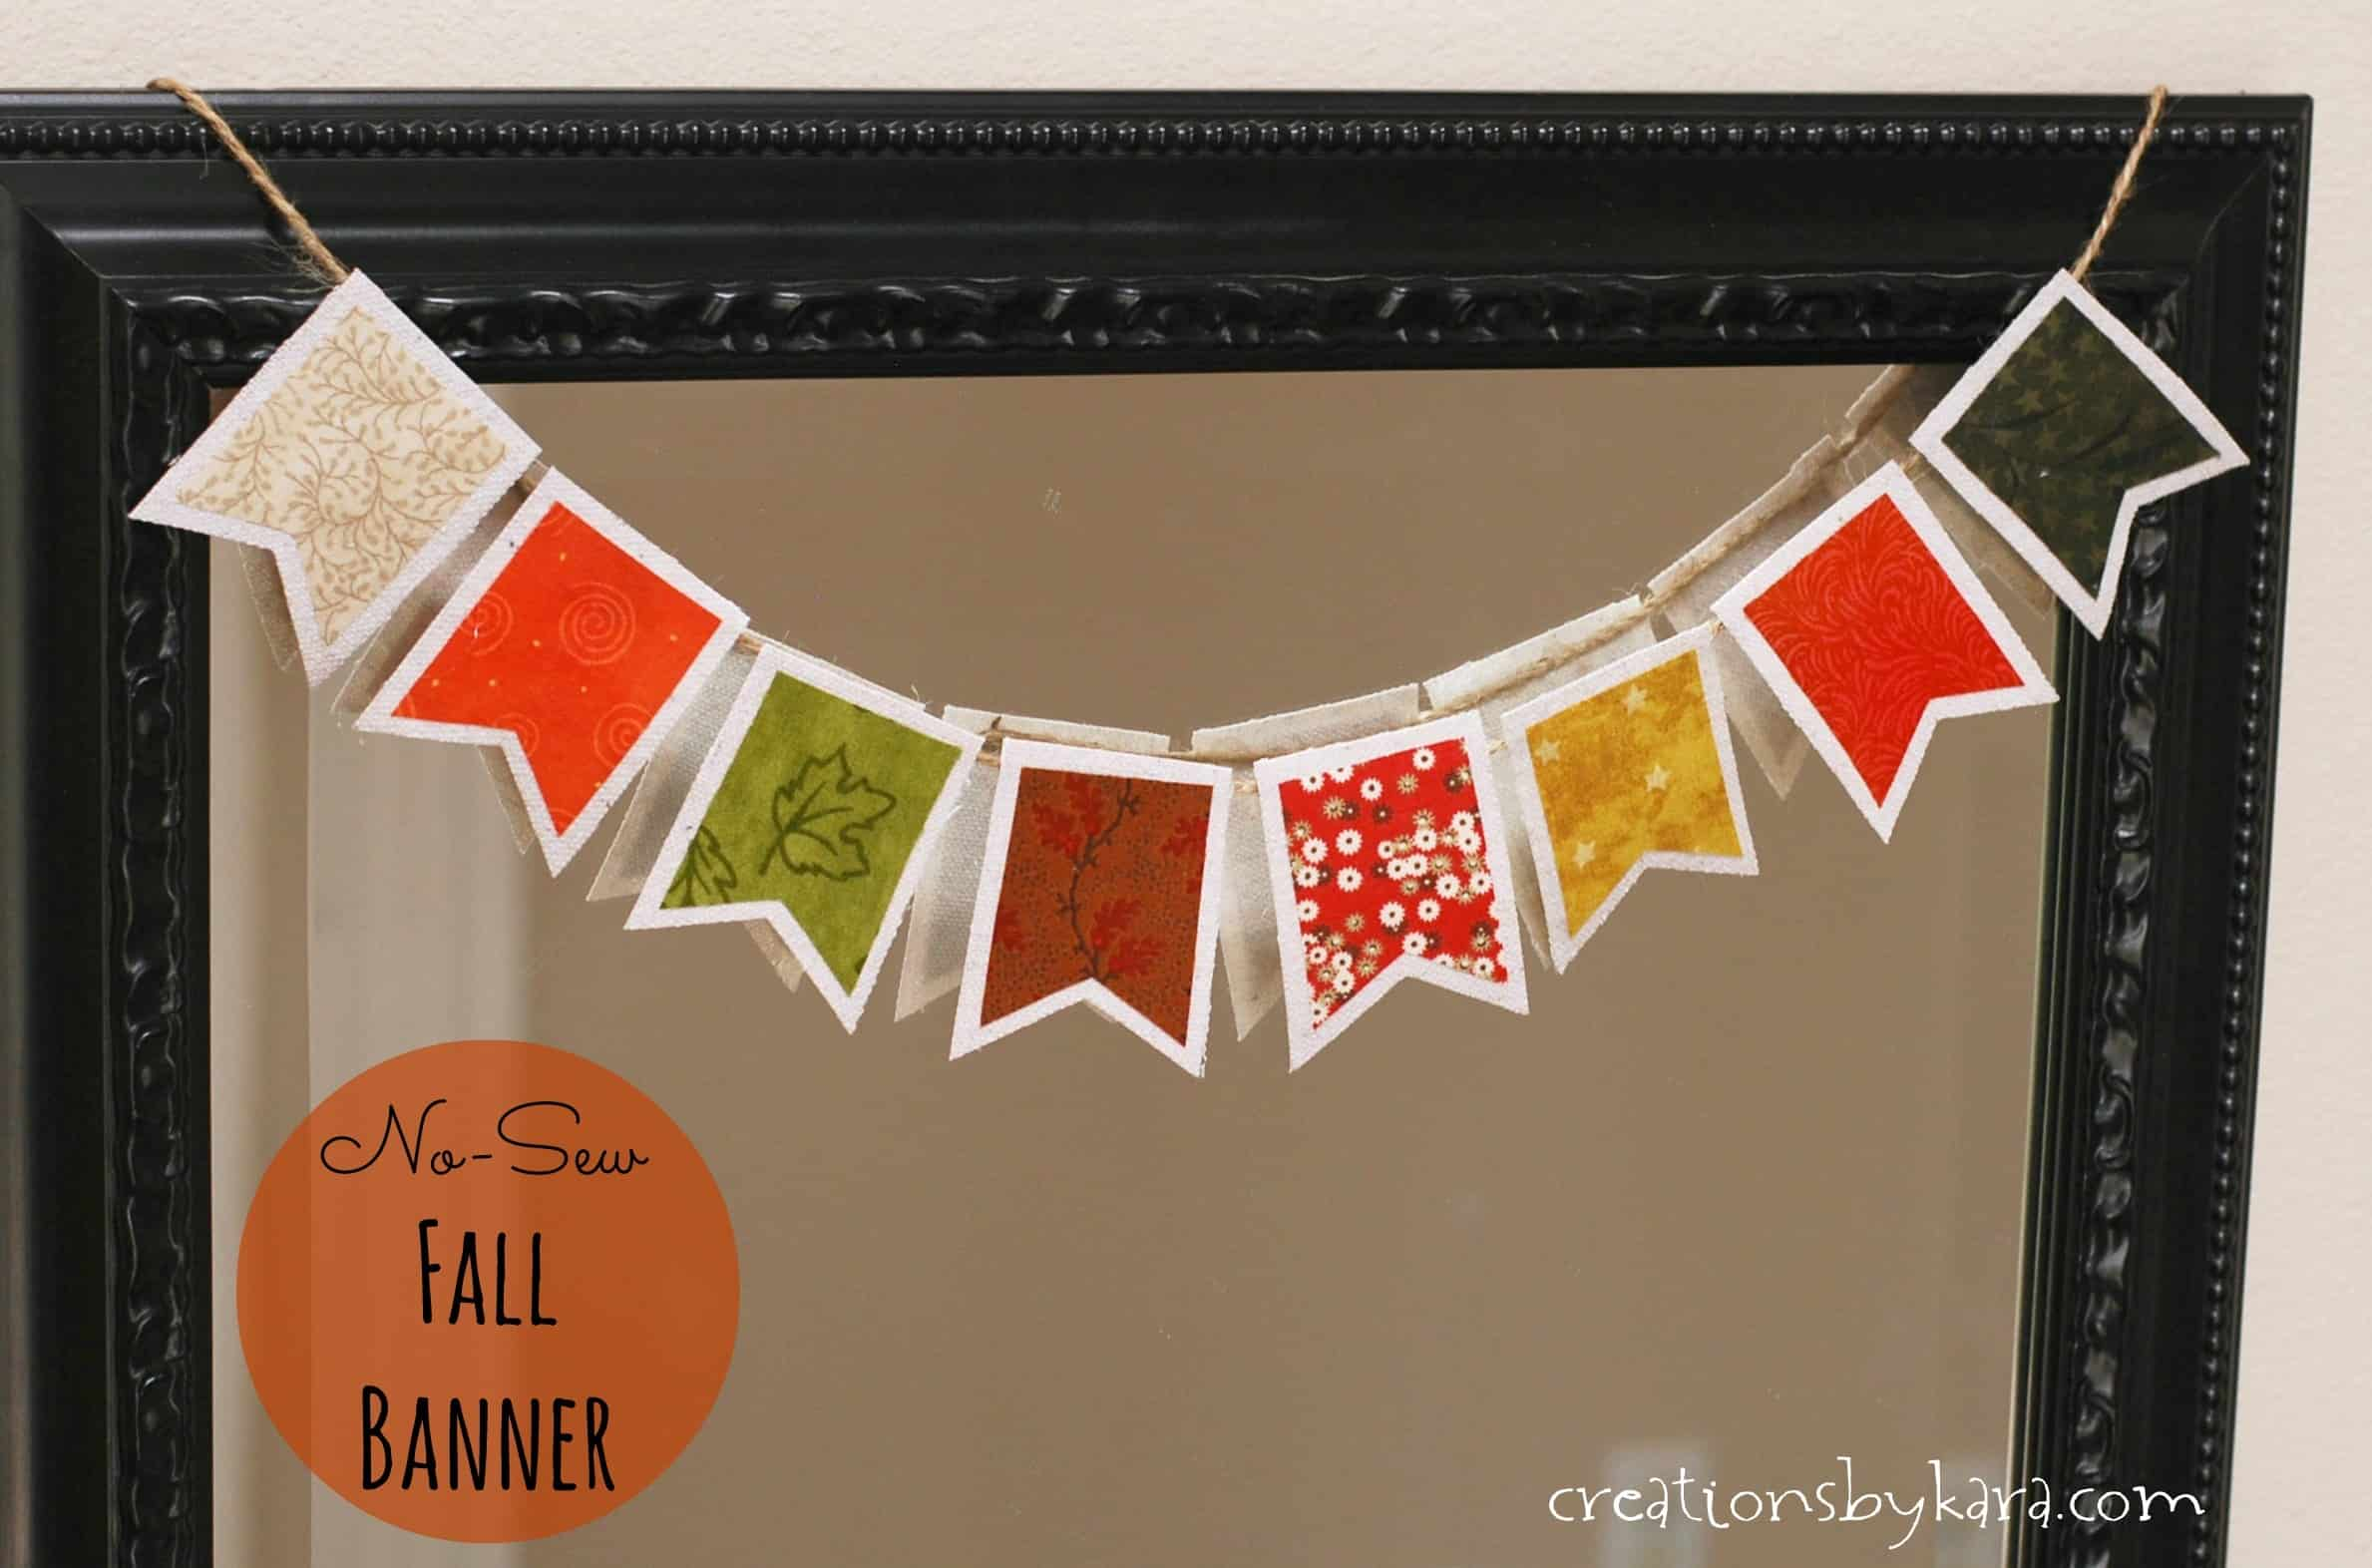 Foyer Entrance Yeast : Easy fall decor no sew fabric banner